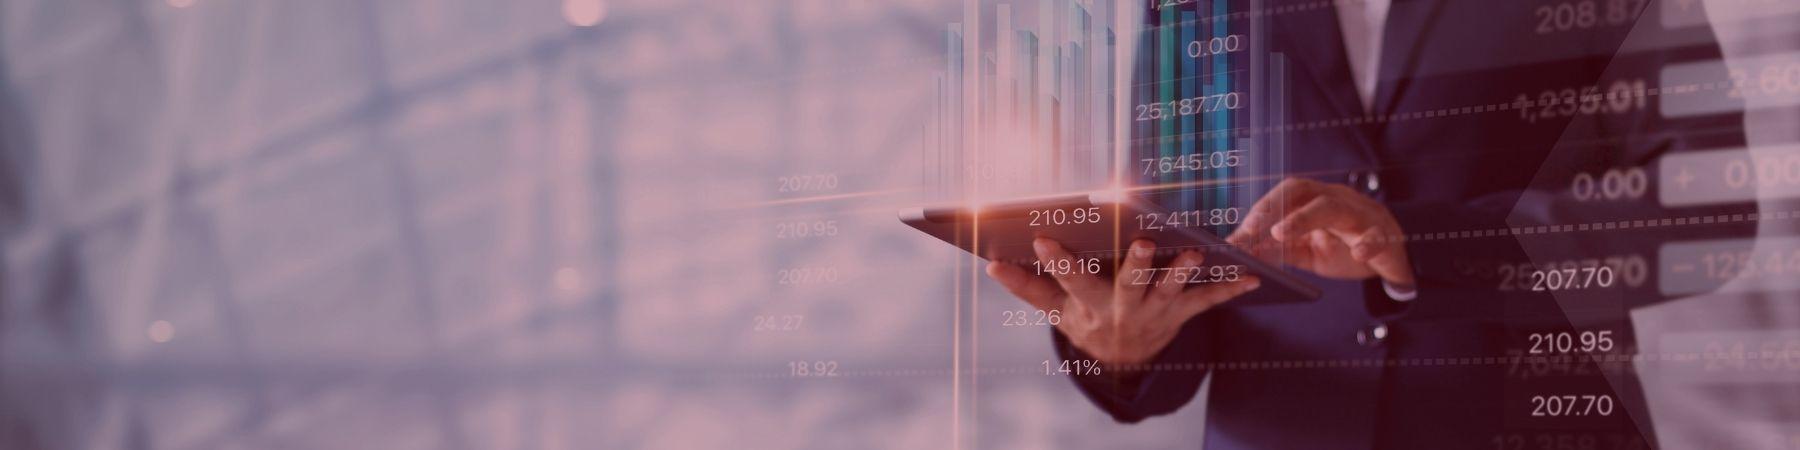 Platform and Analytics Solutions